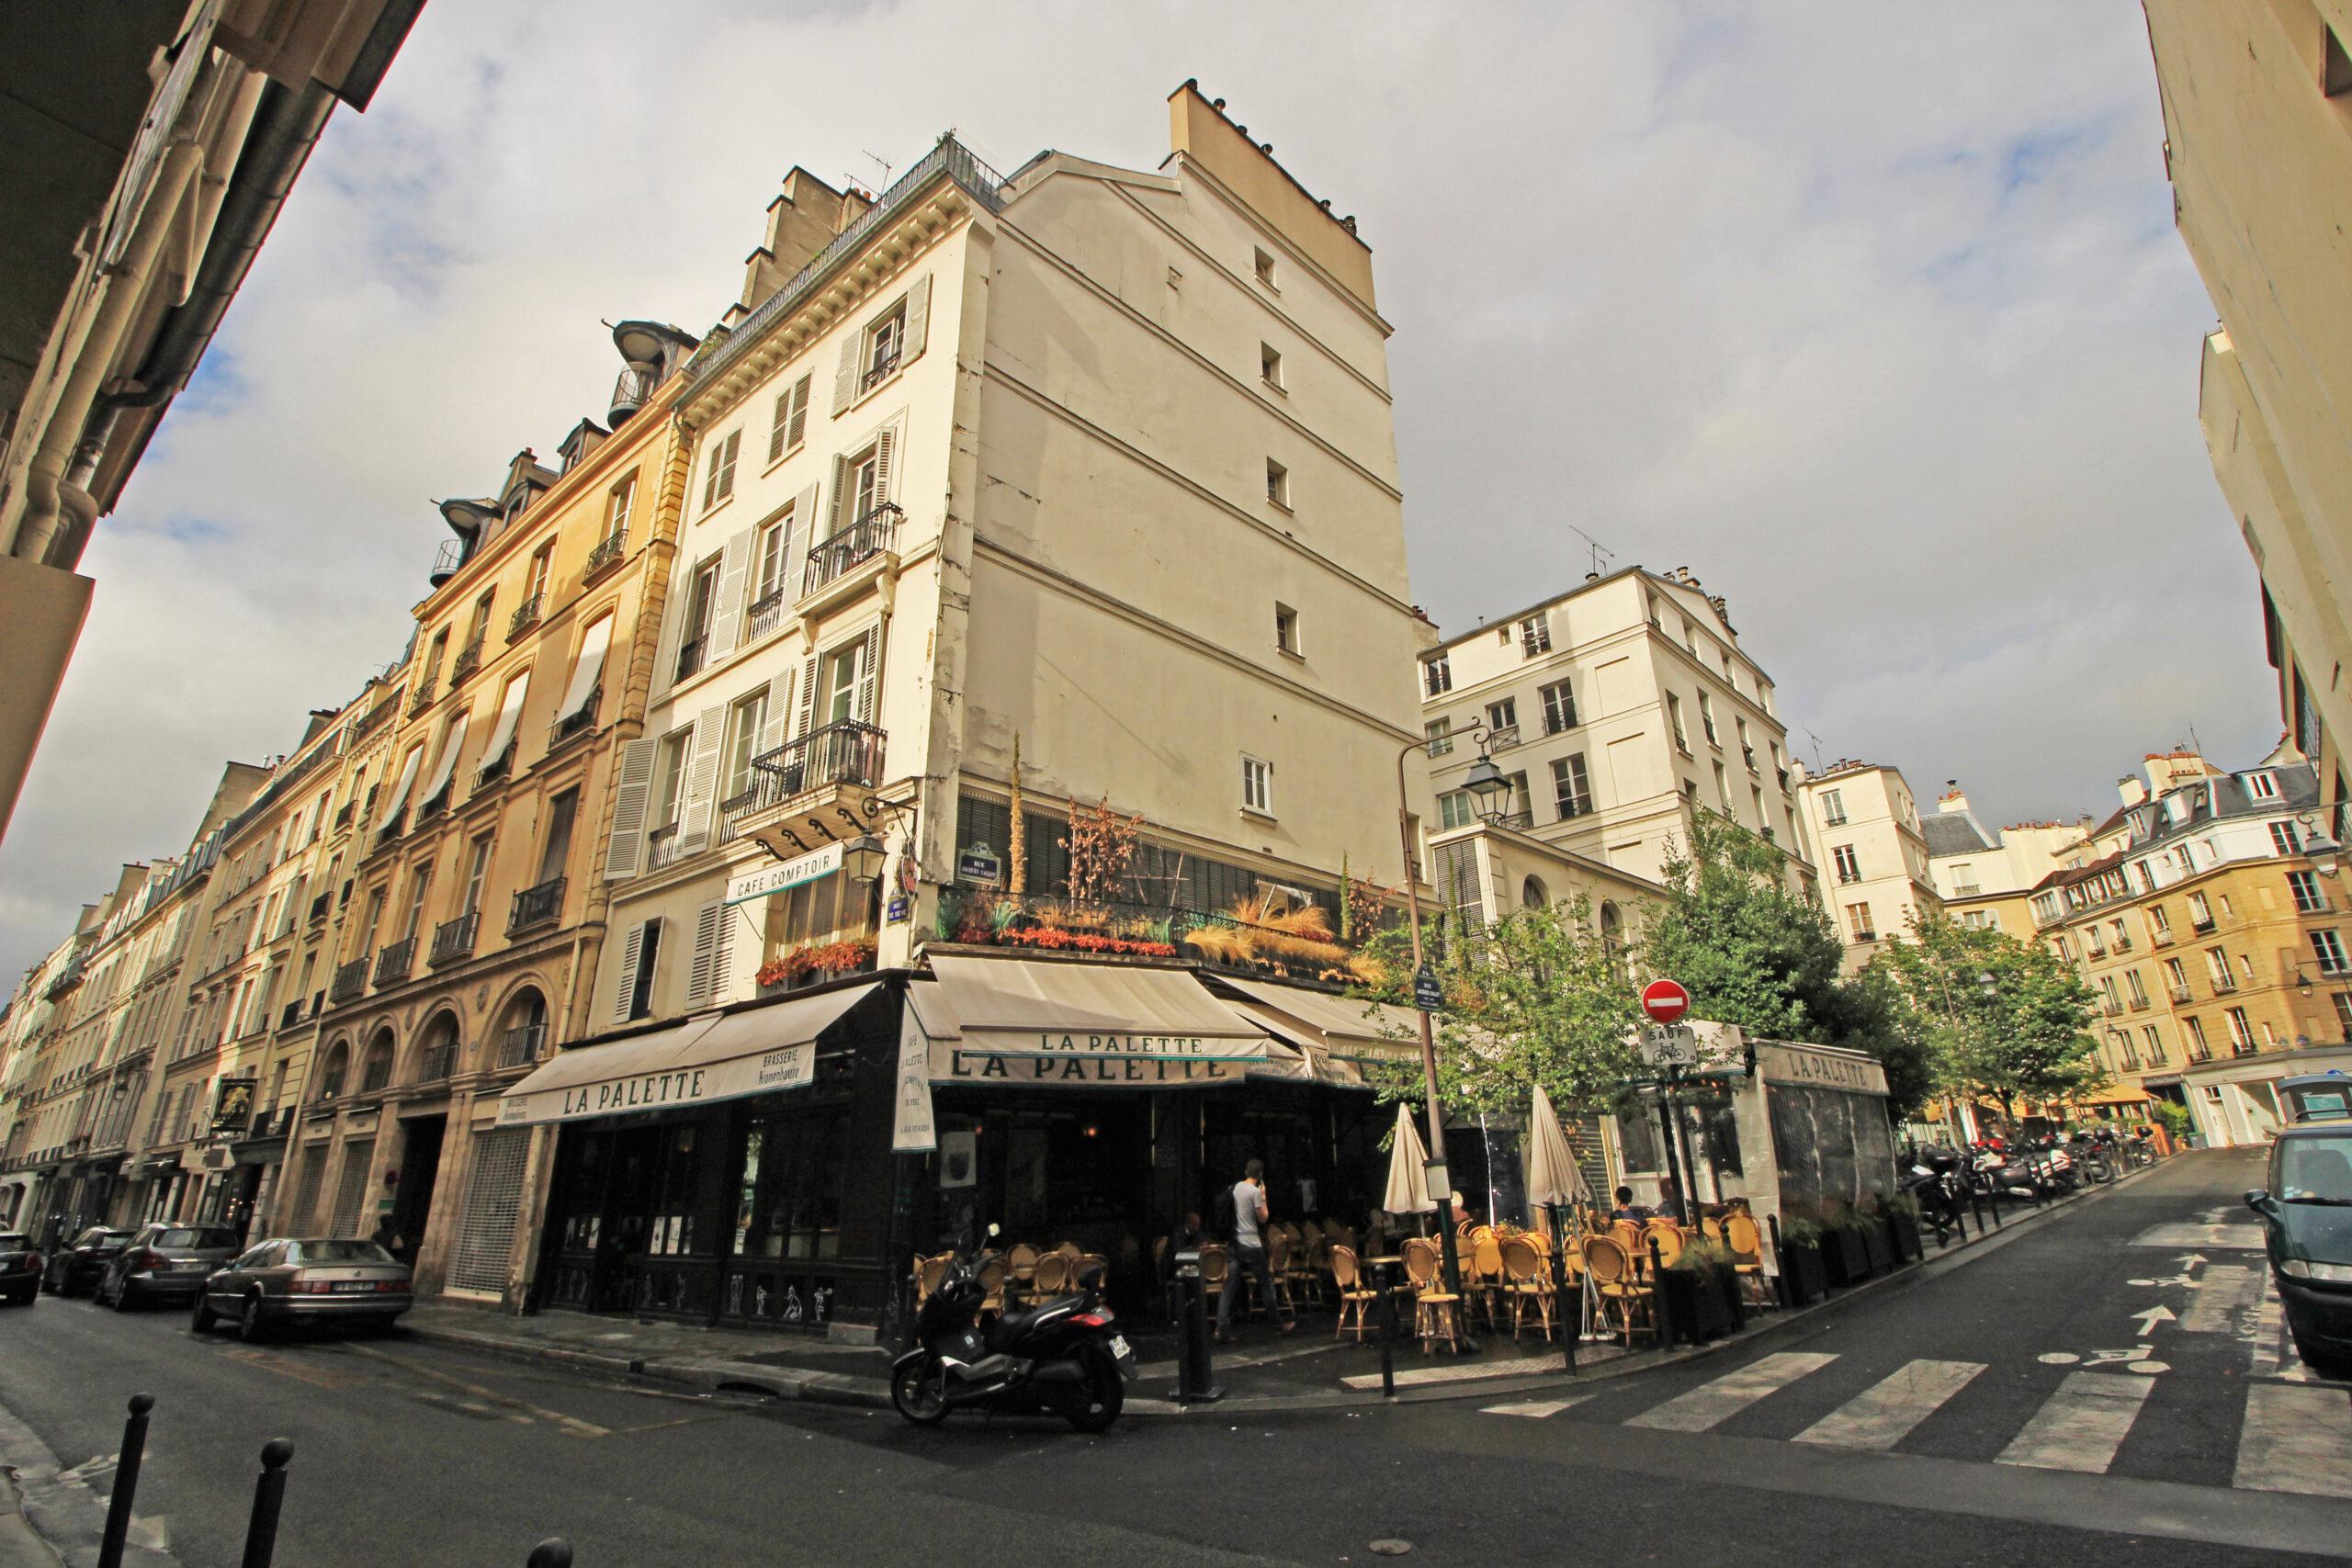 morrison-kafe-la-palette